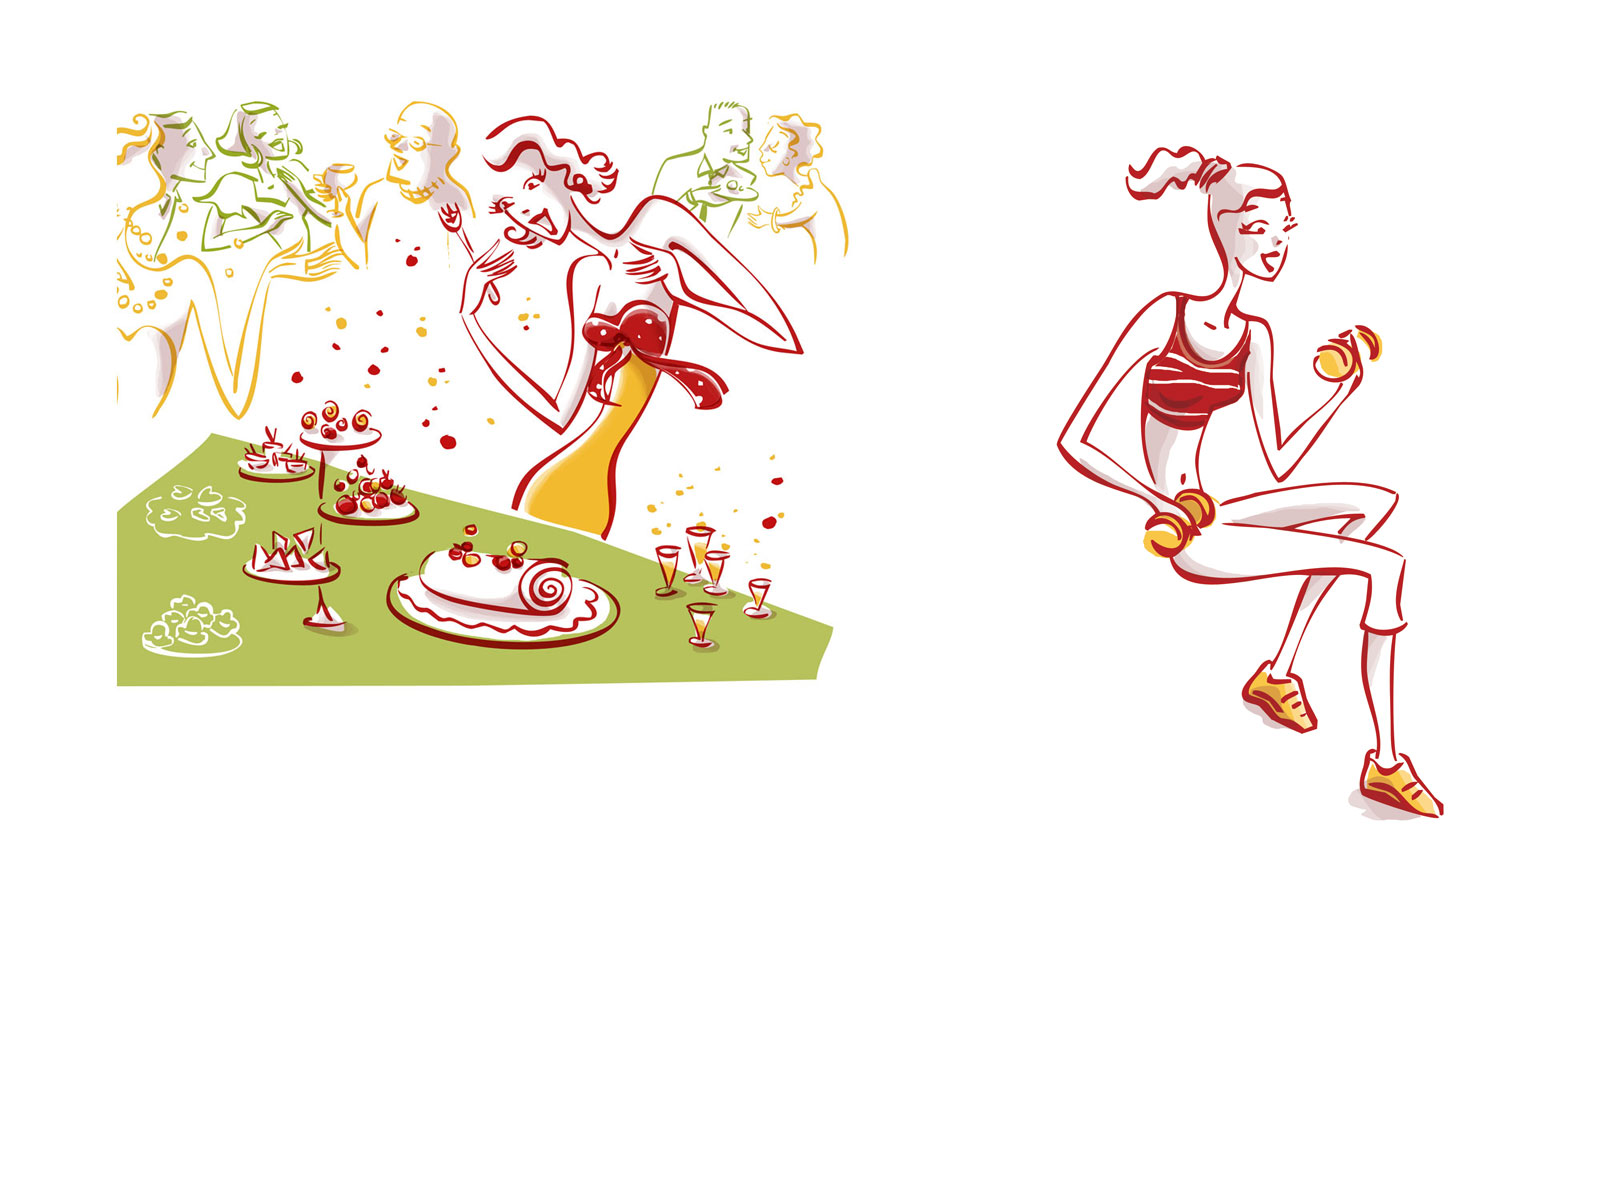 illustrations-beatricefavereau-5815